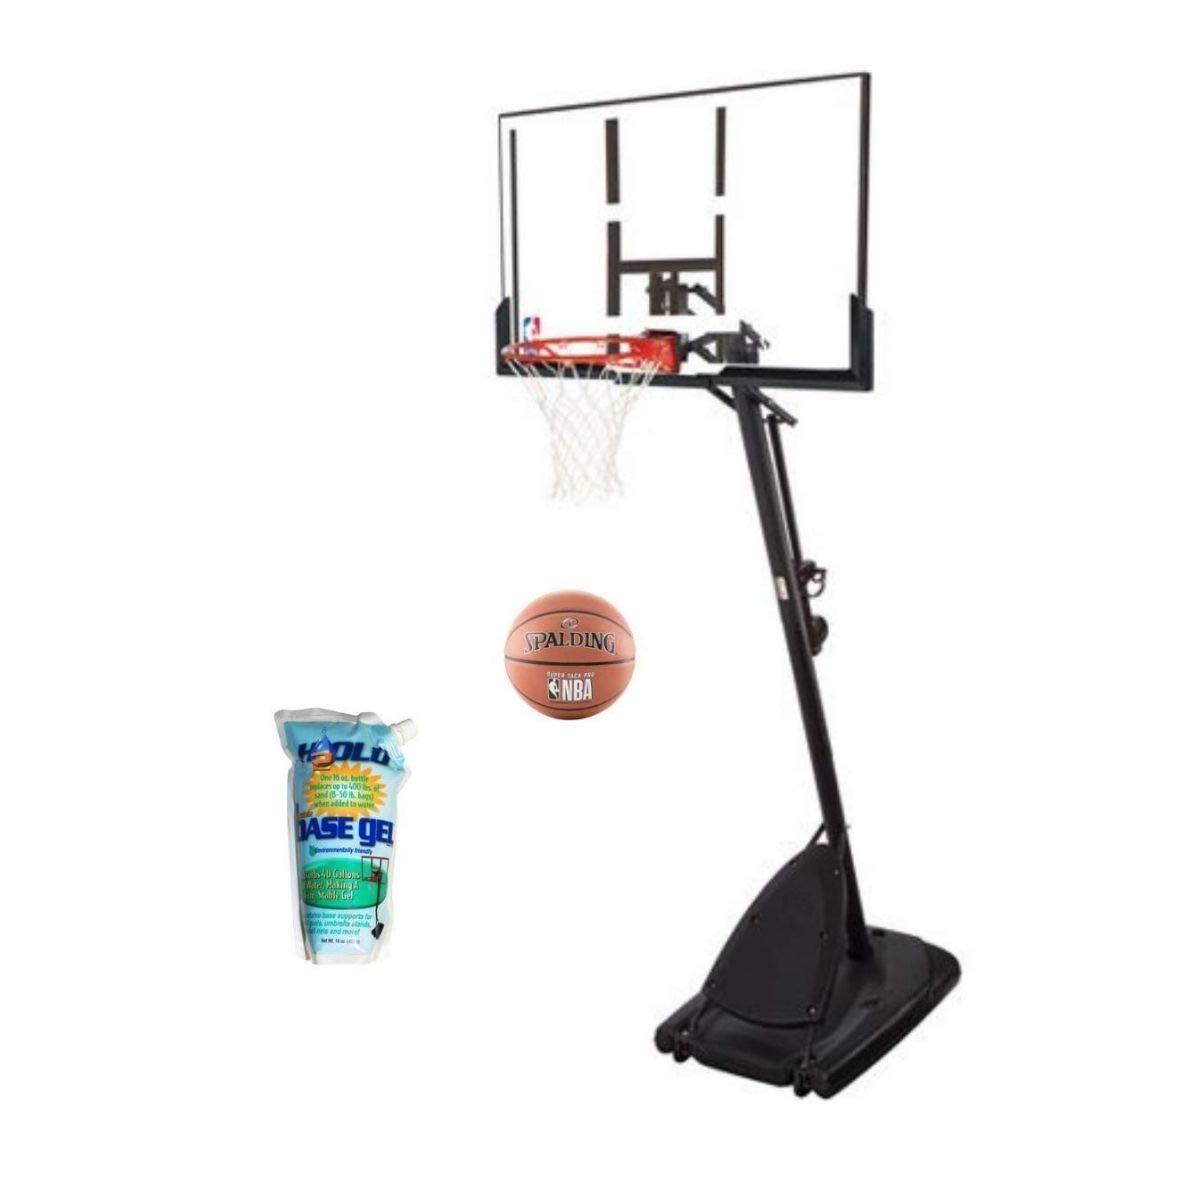 Spalding Pro Slam Portable NBA 54'' Angled Pole Backboard Basketball System with Basegel and 29.5 Super Tack